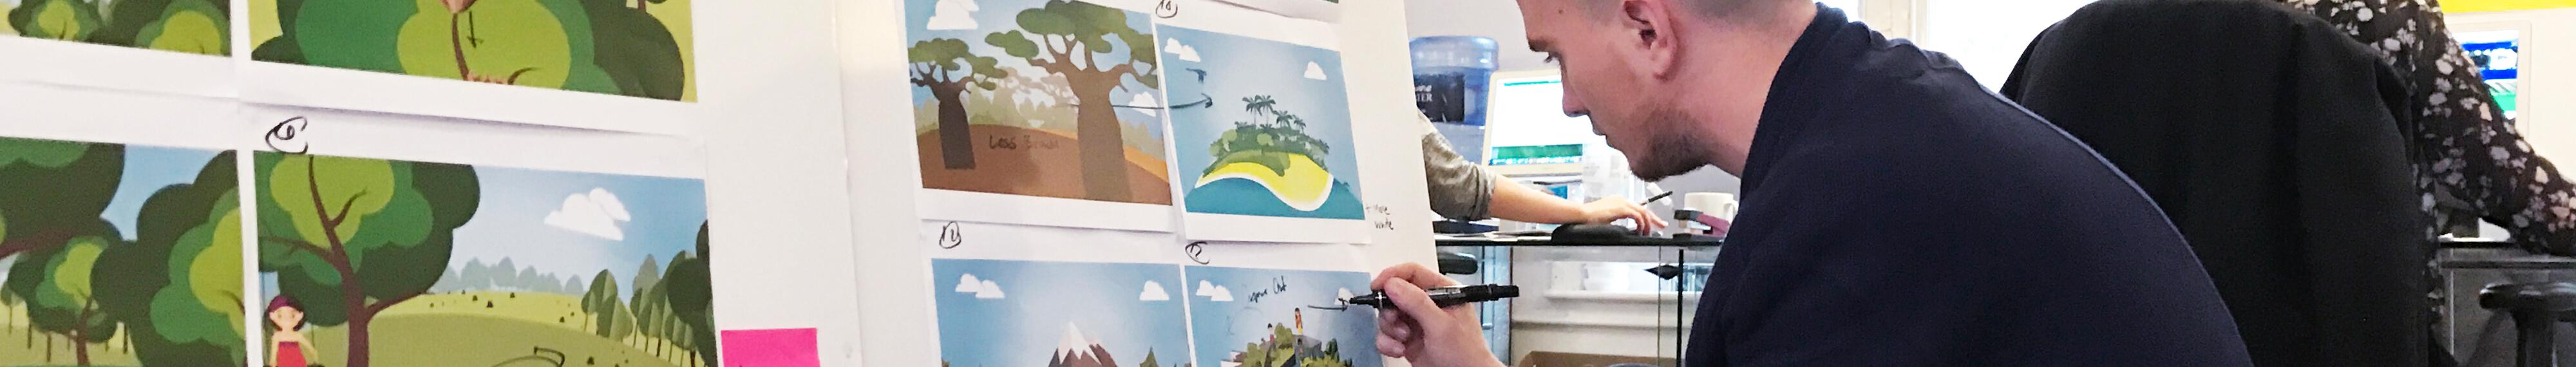 00 - QCC artboard V3.pdfArtboard 1 copy 9